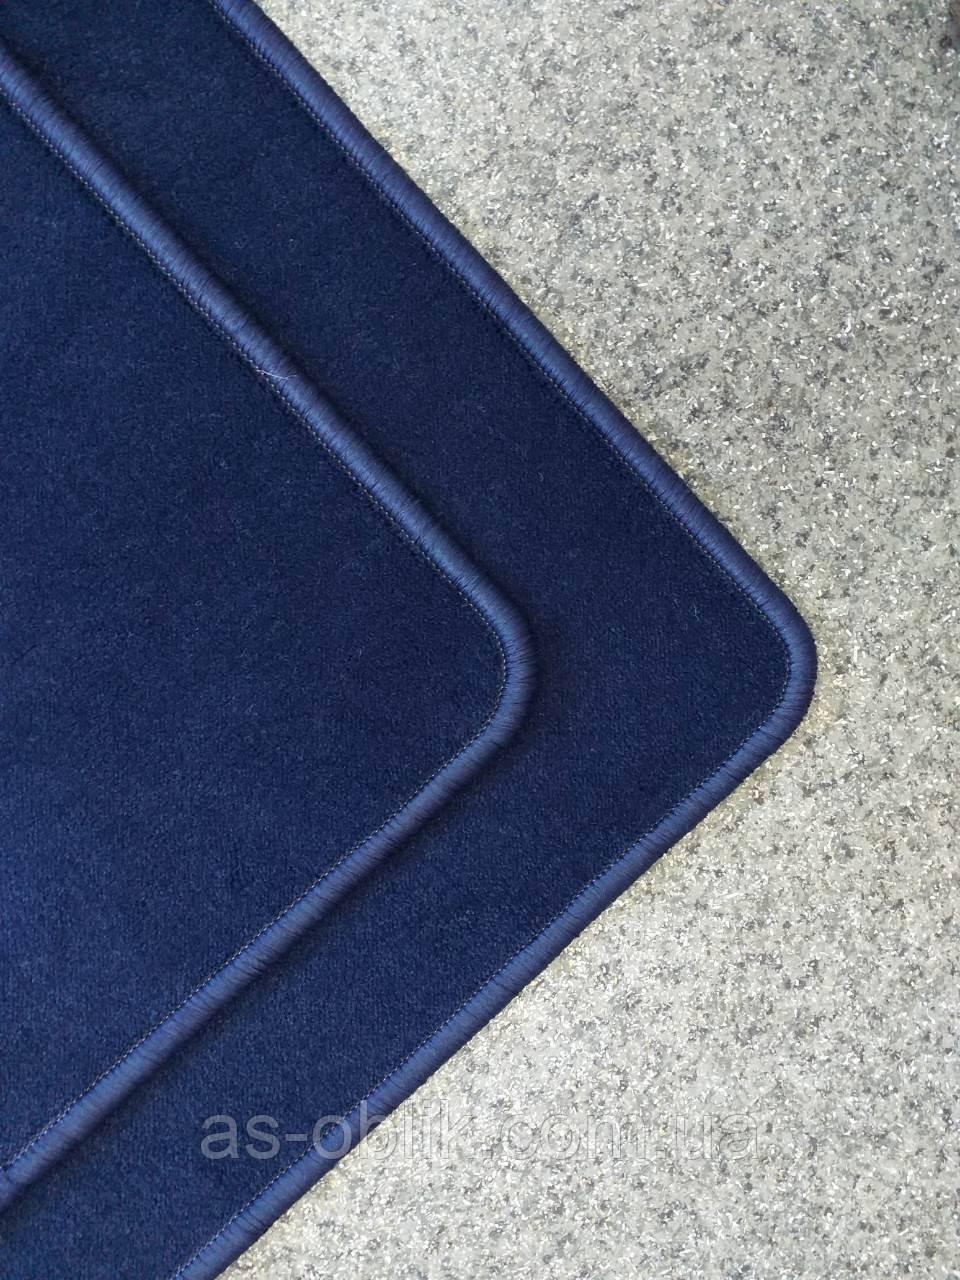 Коврик прикроватный 700х500 мм синий